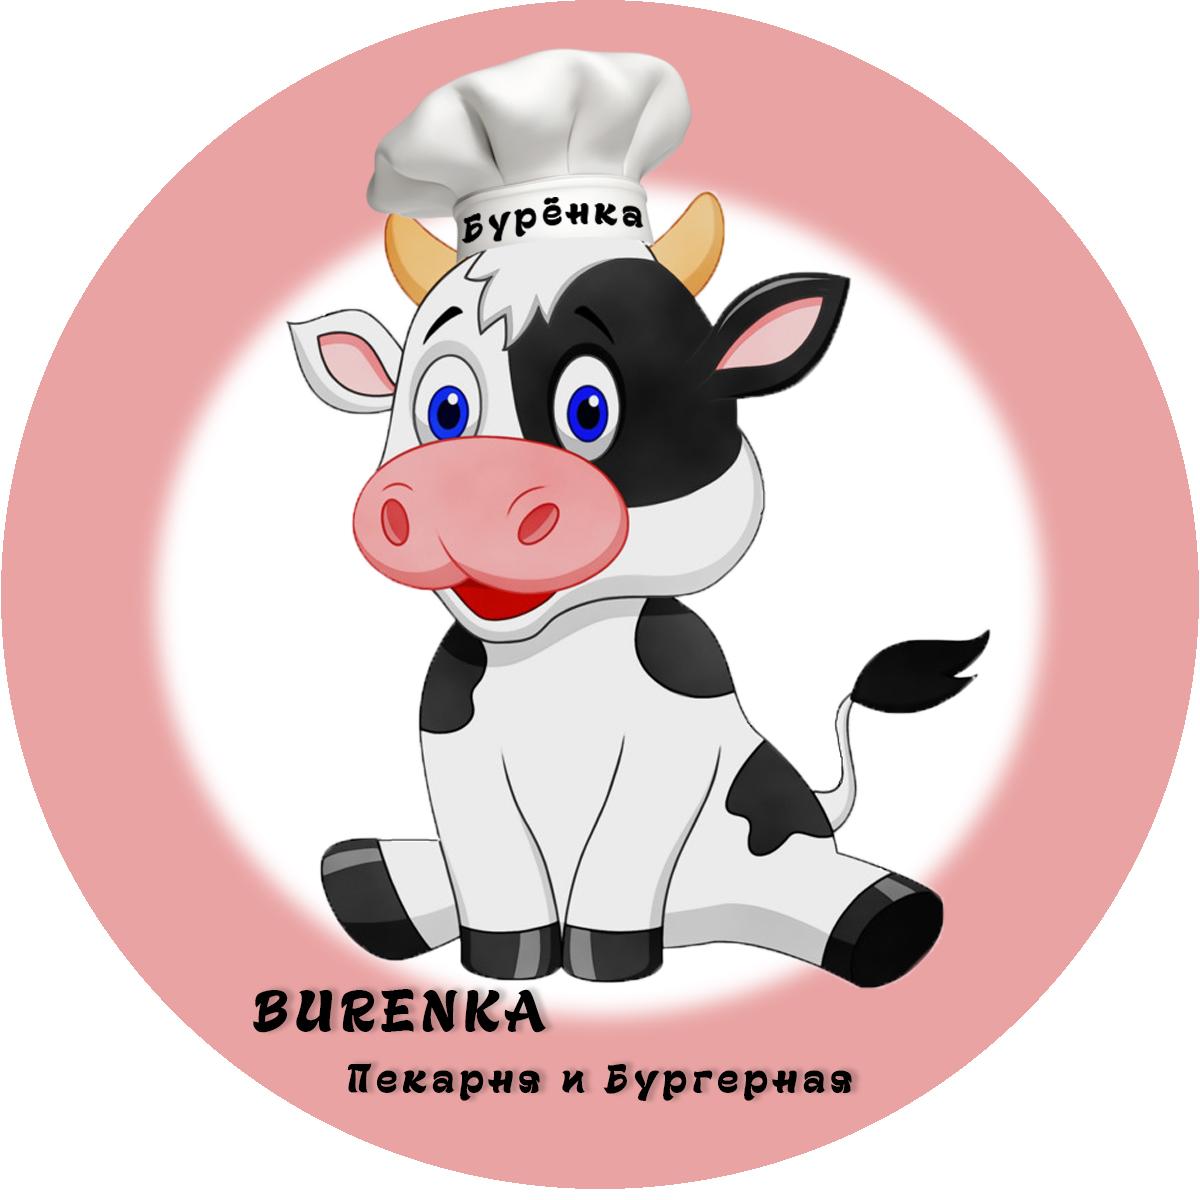 Логотип для Бургерной с Пекарней фото f_2675e11f052bd05d.jpg